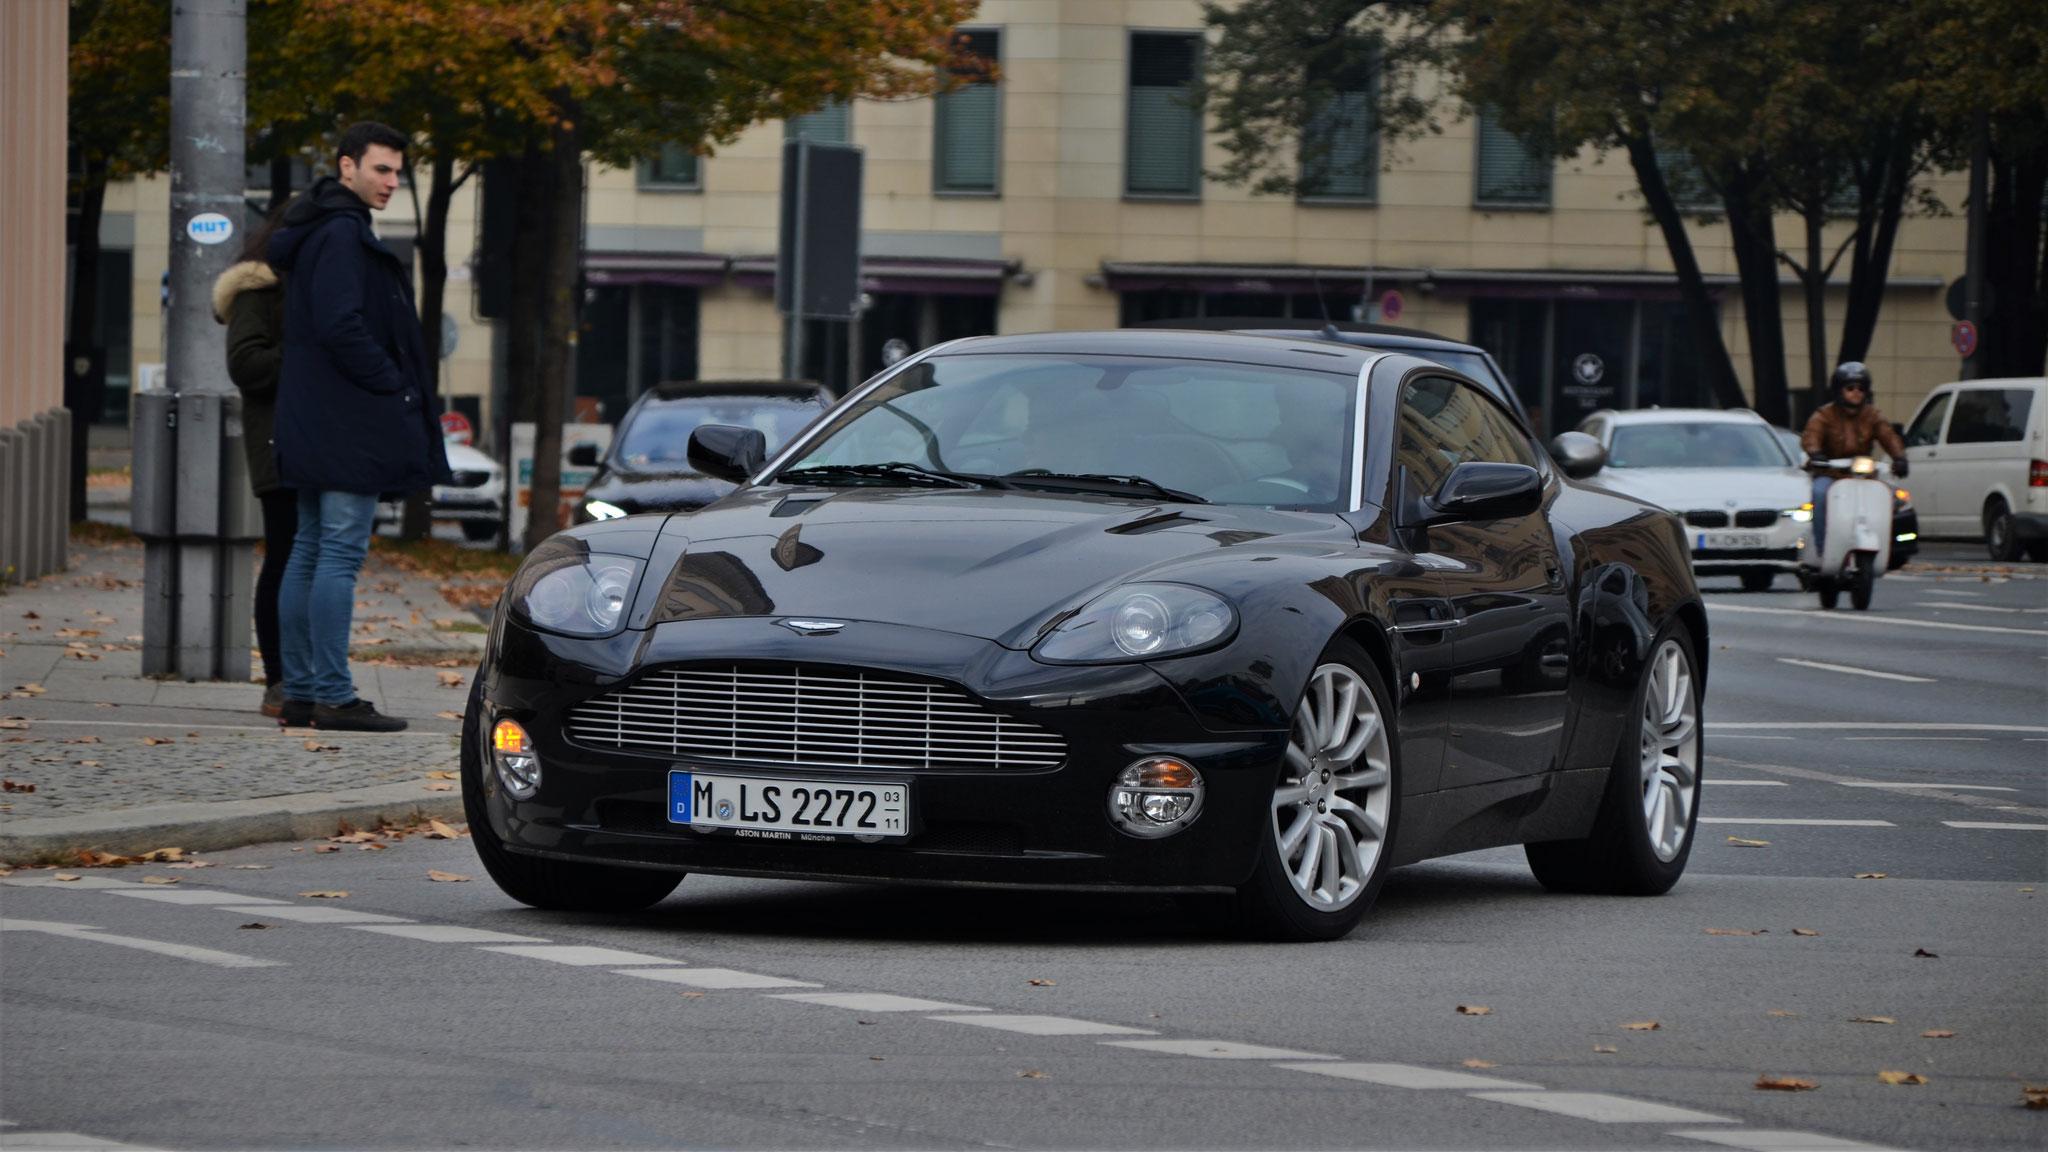 Aston Martin V12 Vanquish - M-LS-2272